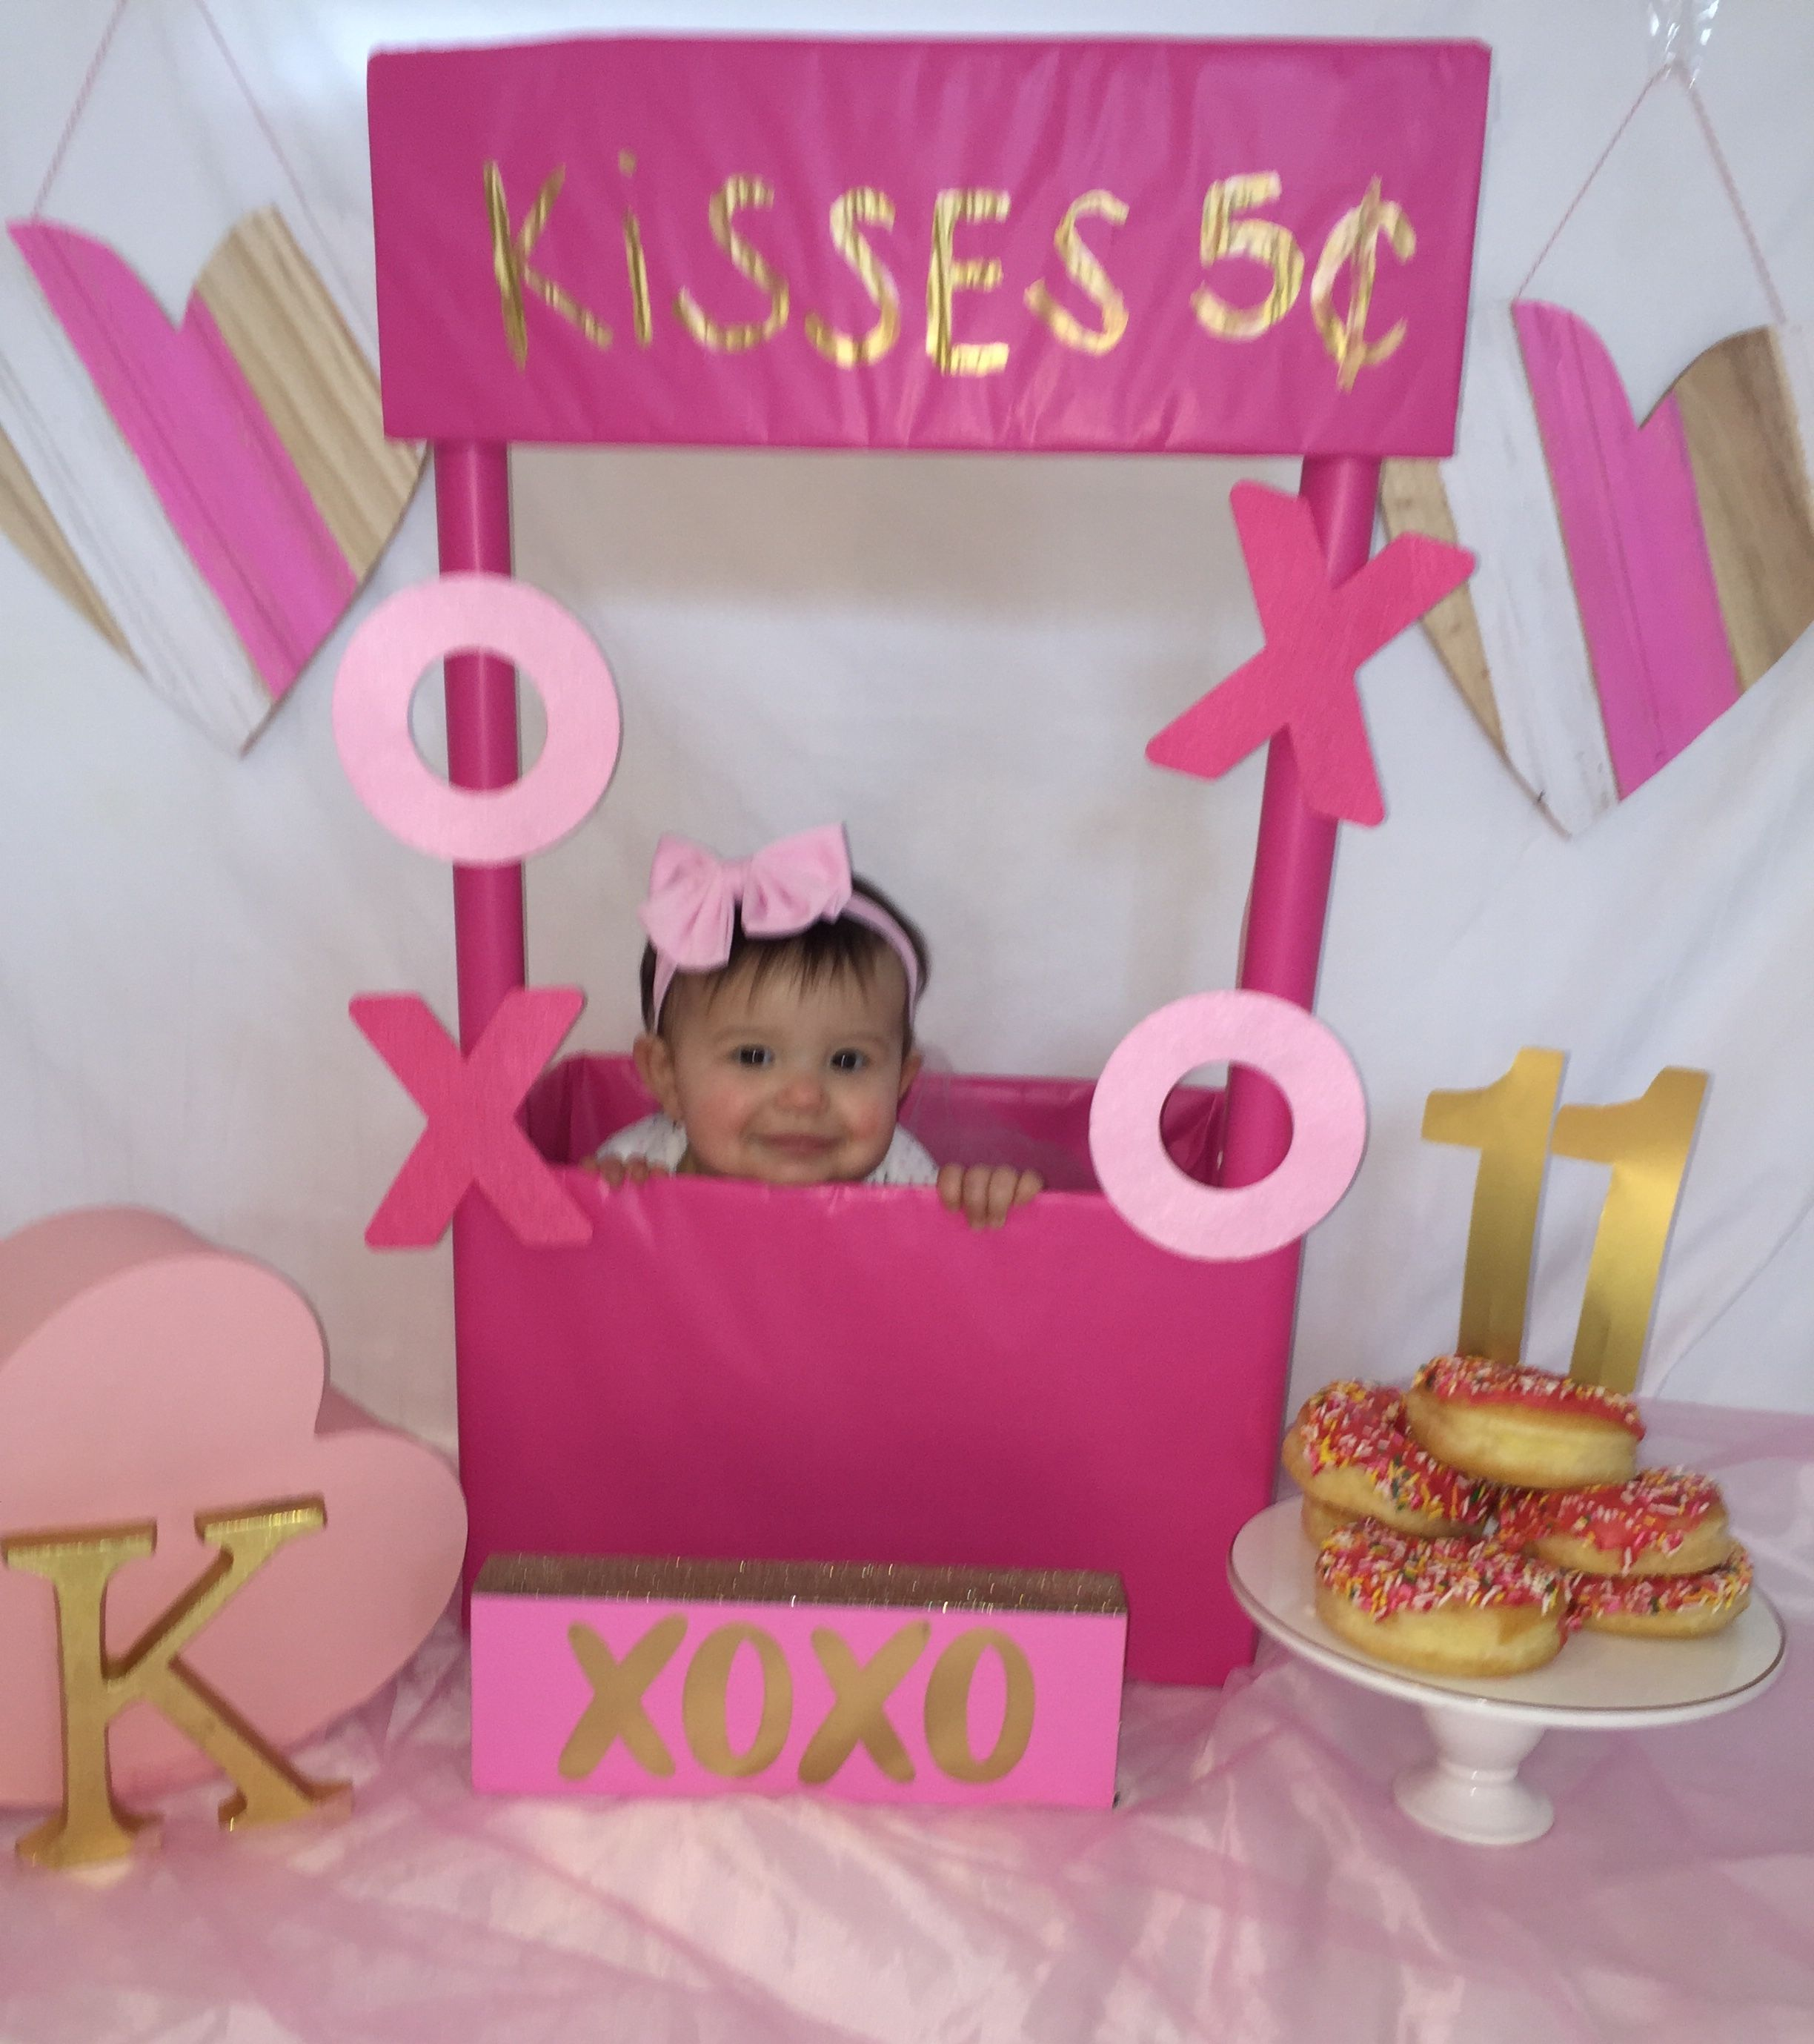 Monthly Photos Baby Photos 11 Months Birthdays Birthday Photos 12th Birthday Birthday